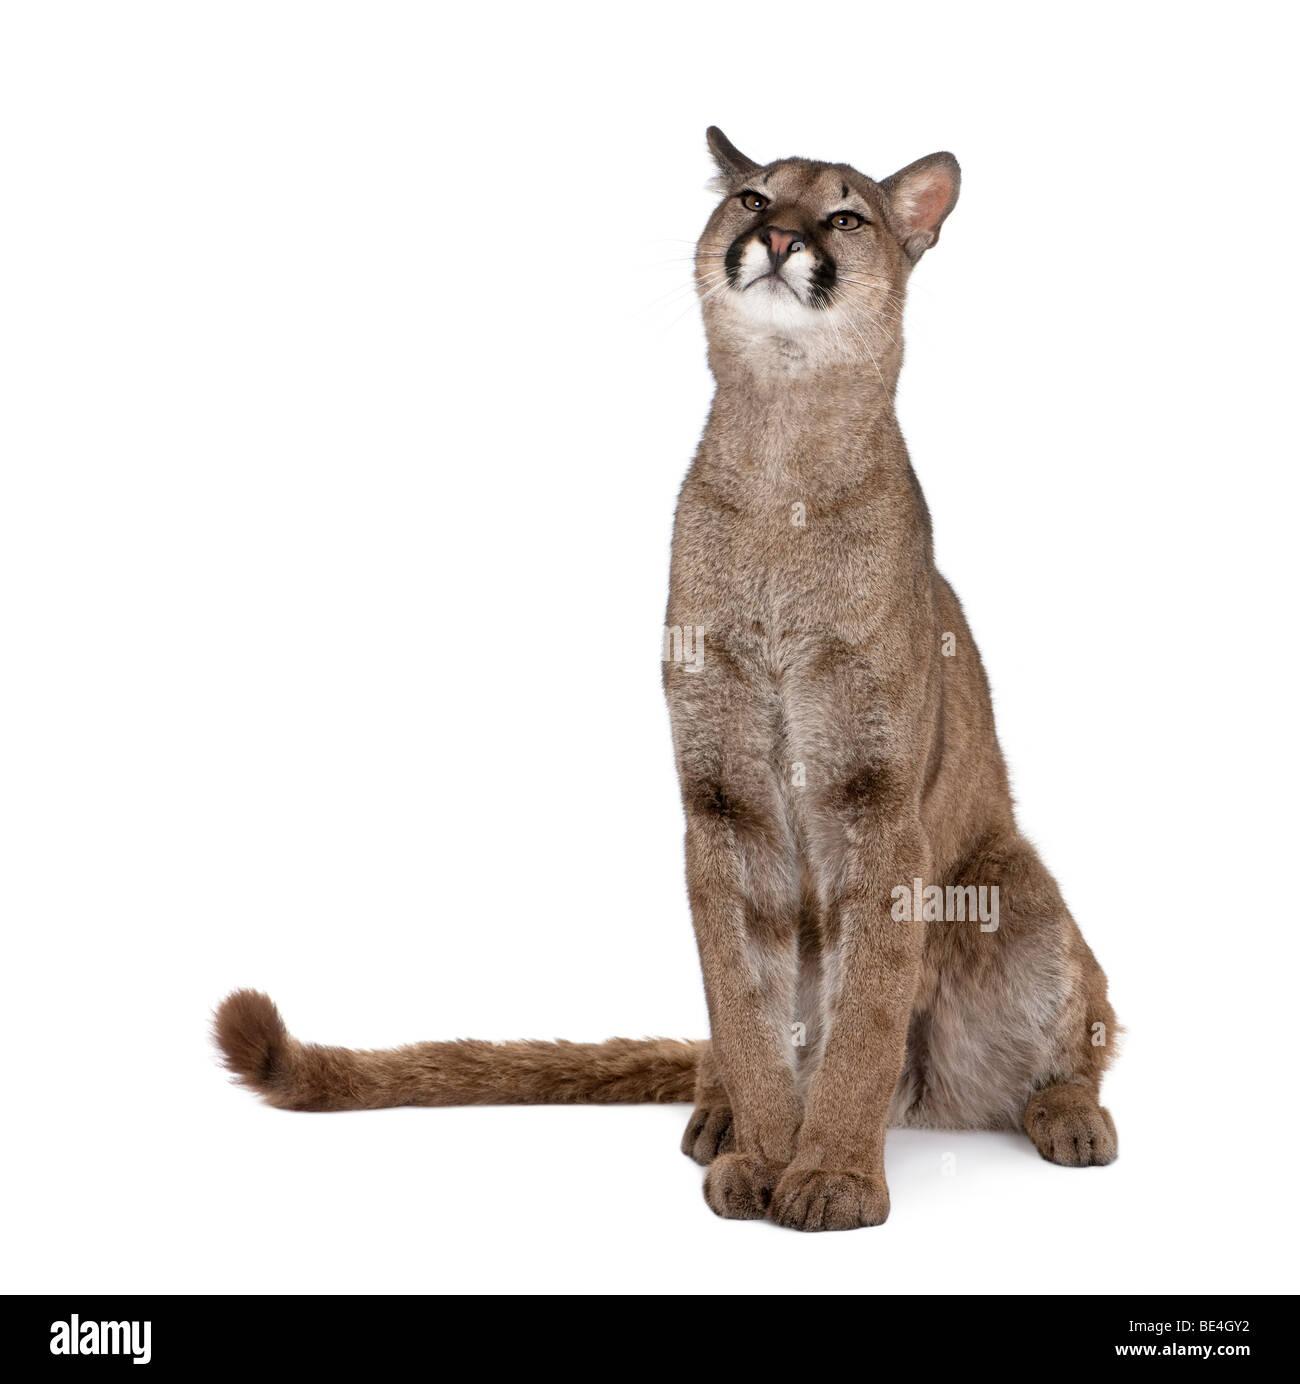 Portrait of Puma cub, Puma concolor, 1 year old, sitting against white background, studio shot - Stock Image